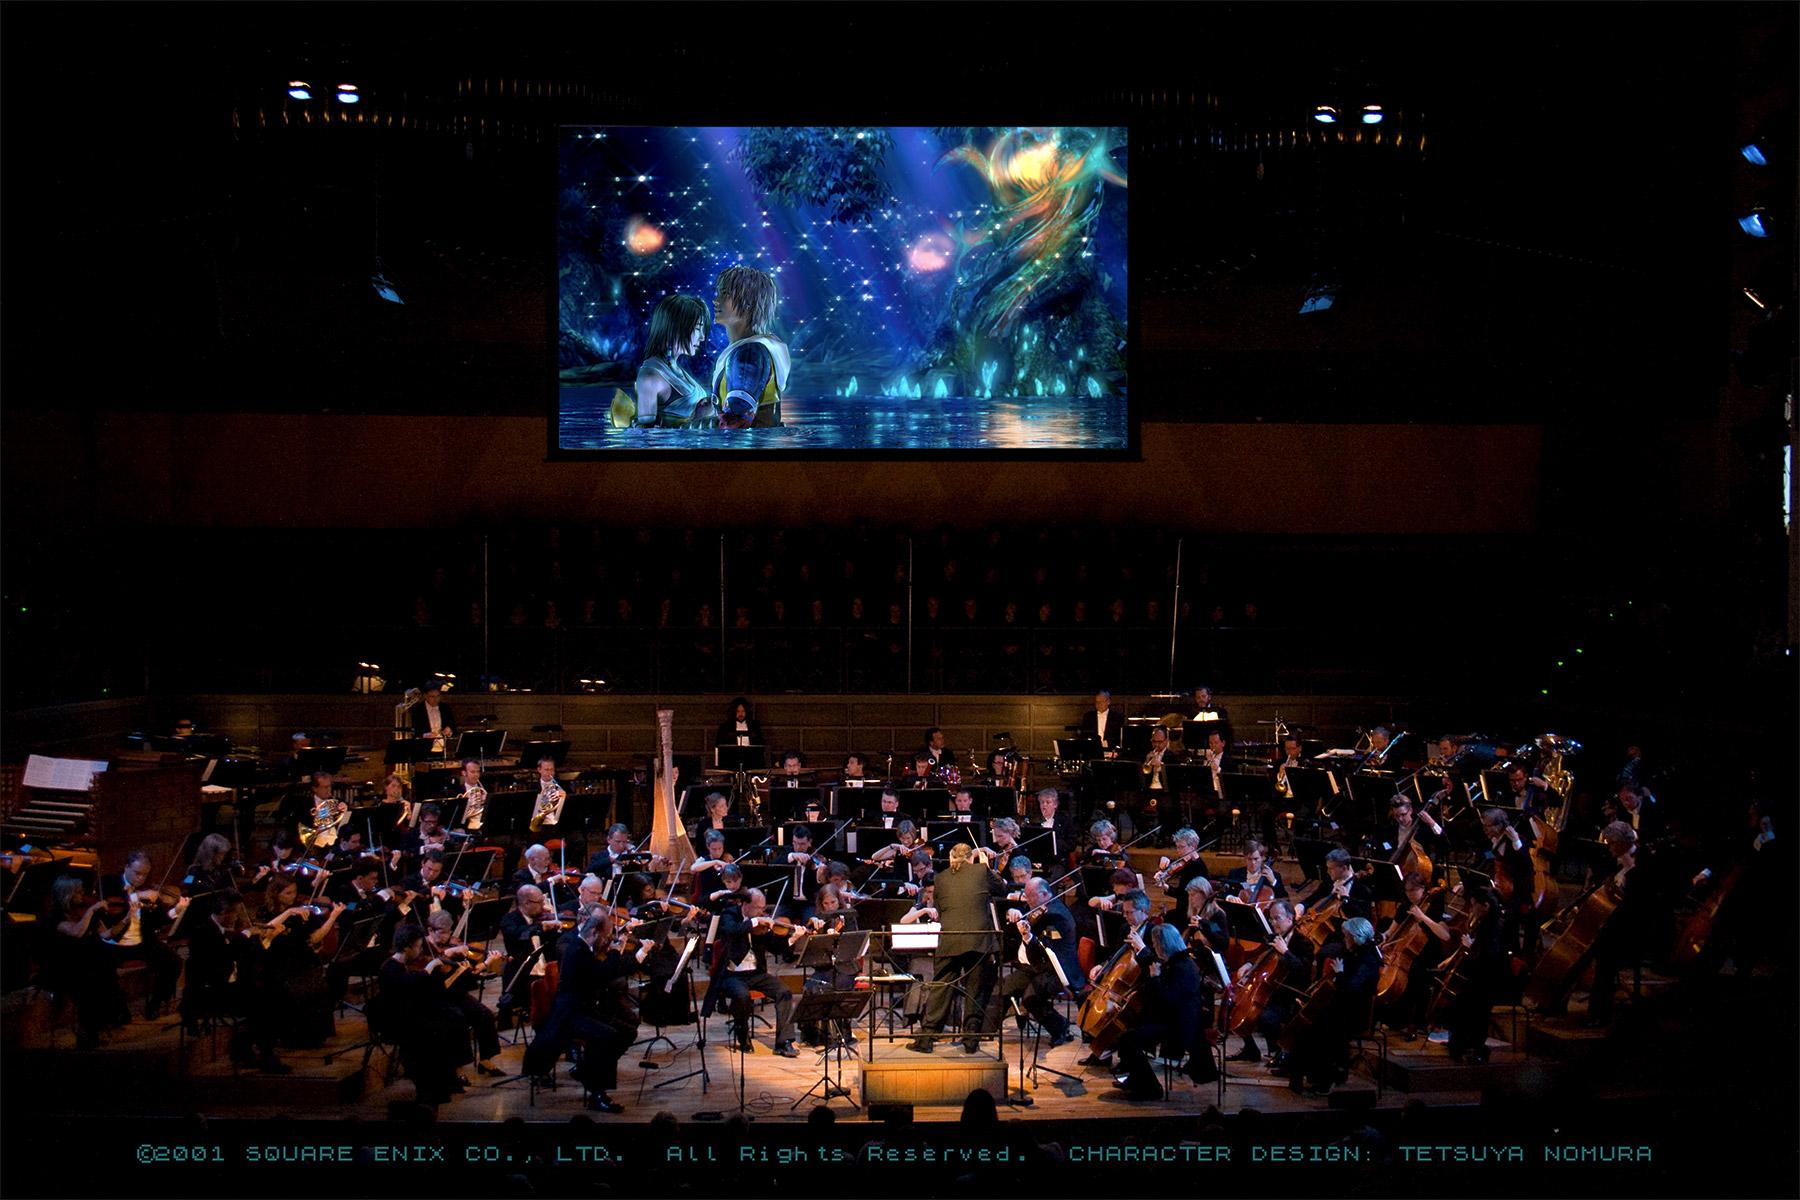 concerto-distant-worlds-final-fantasy